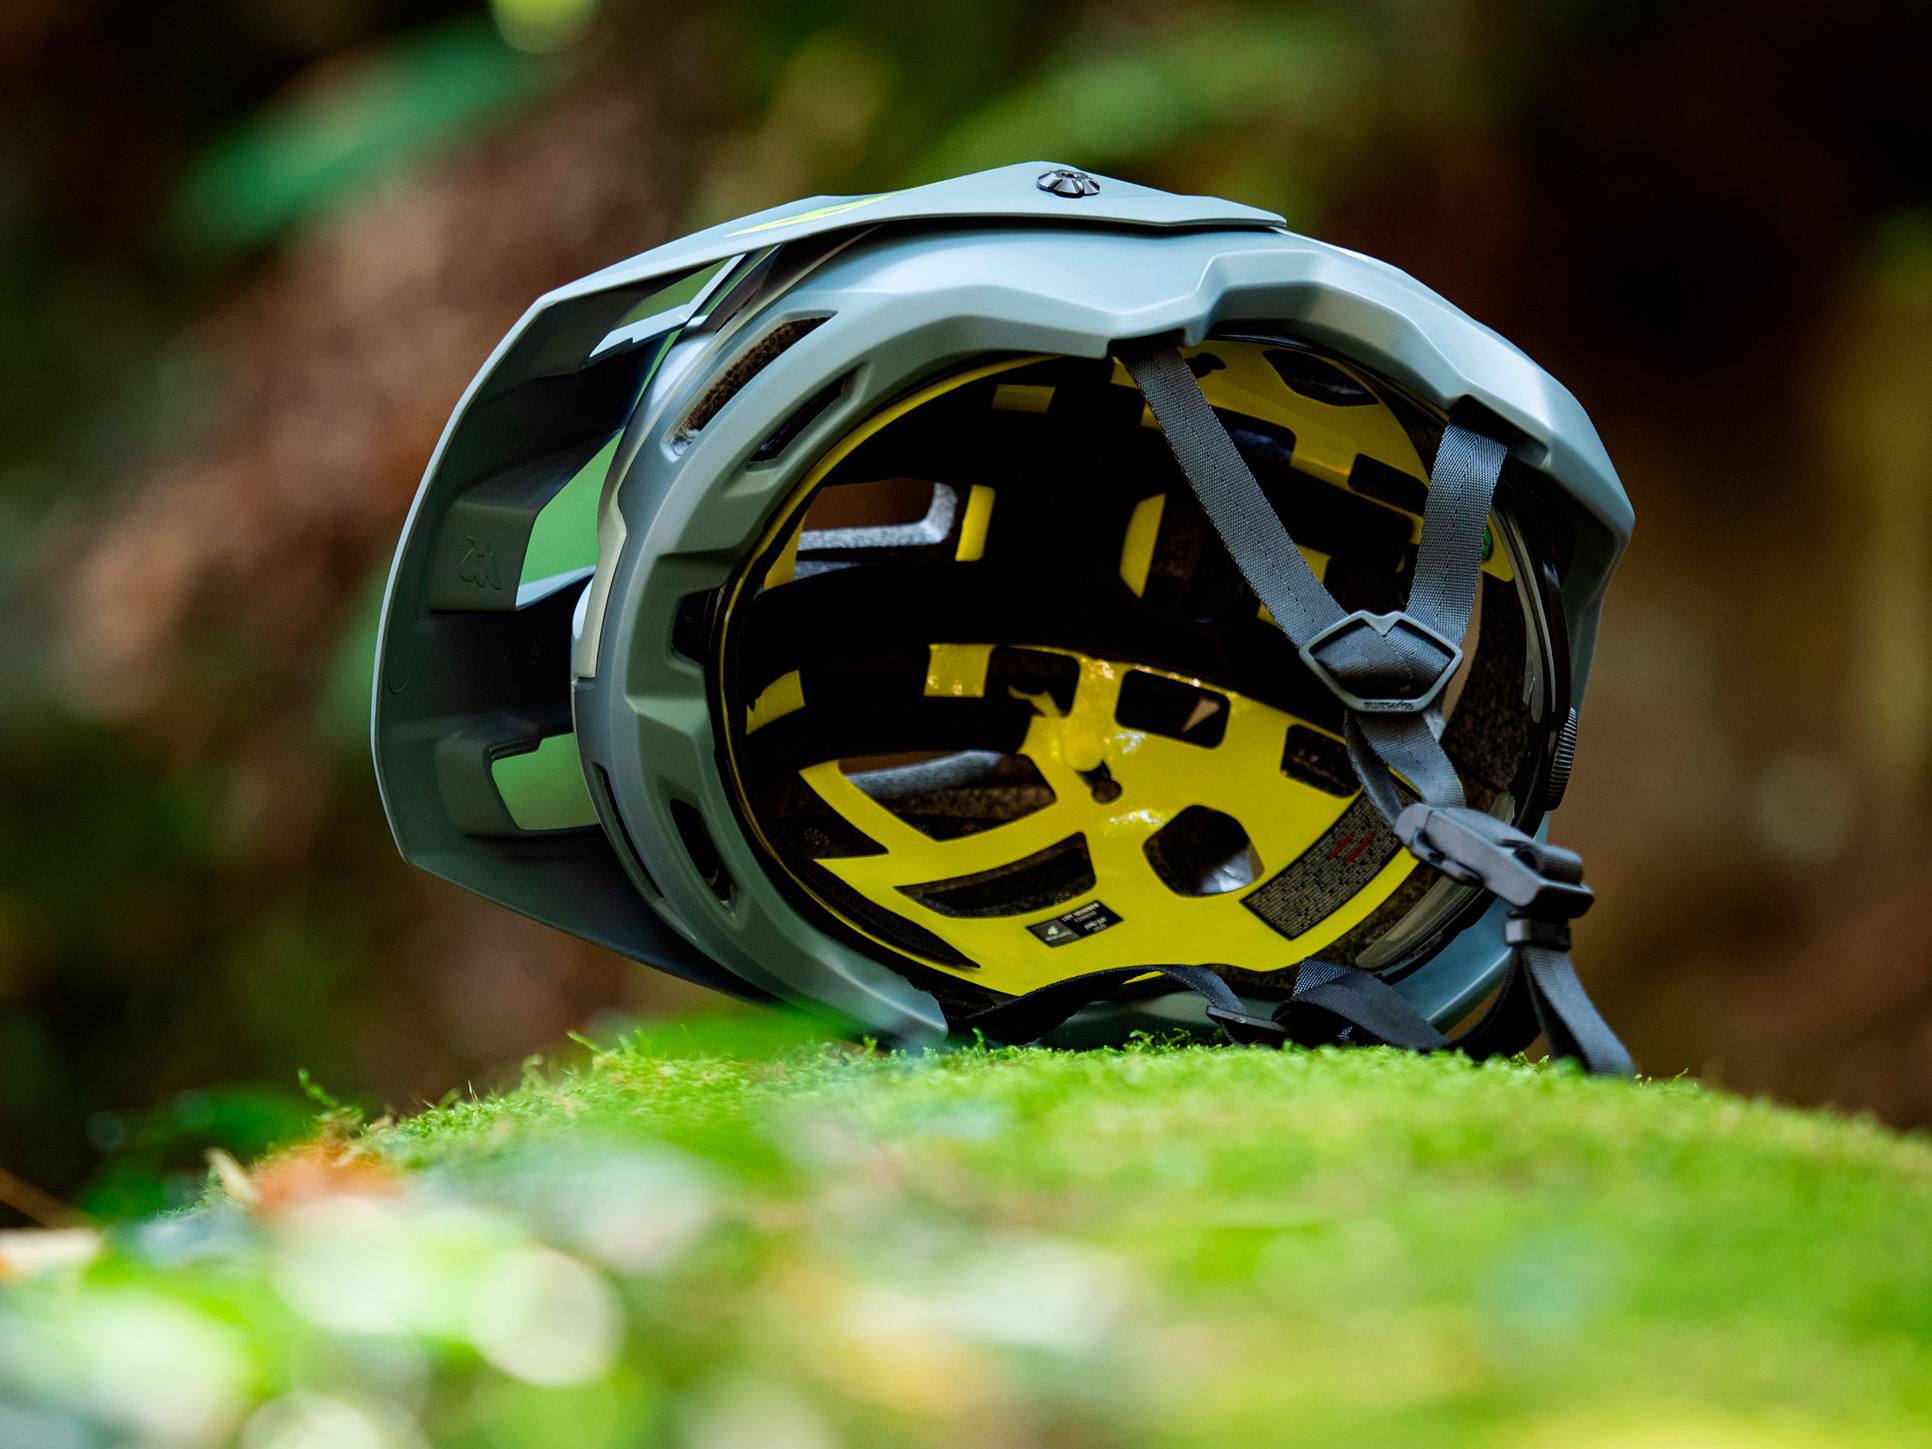 Bluegrass Eagle Has a new Half Shell Mountain Bike Helmet Called the Rogue - Singletracks Mountain Bike News